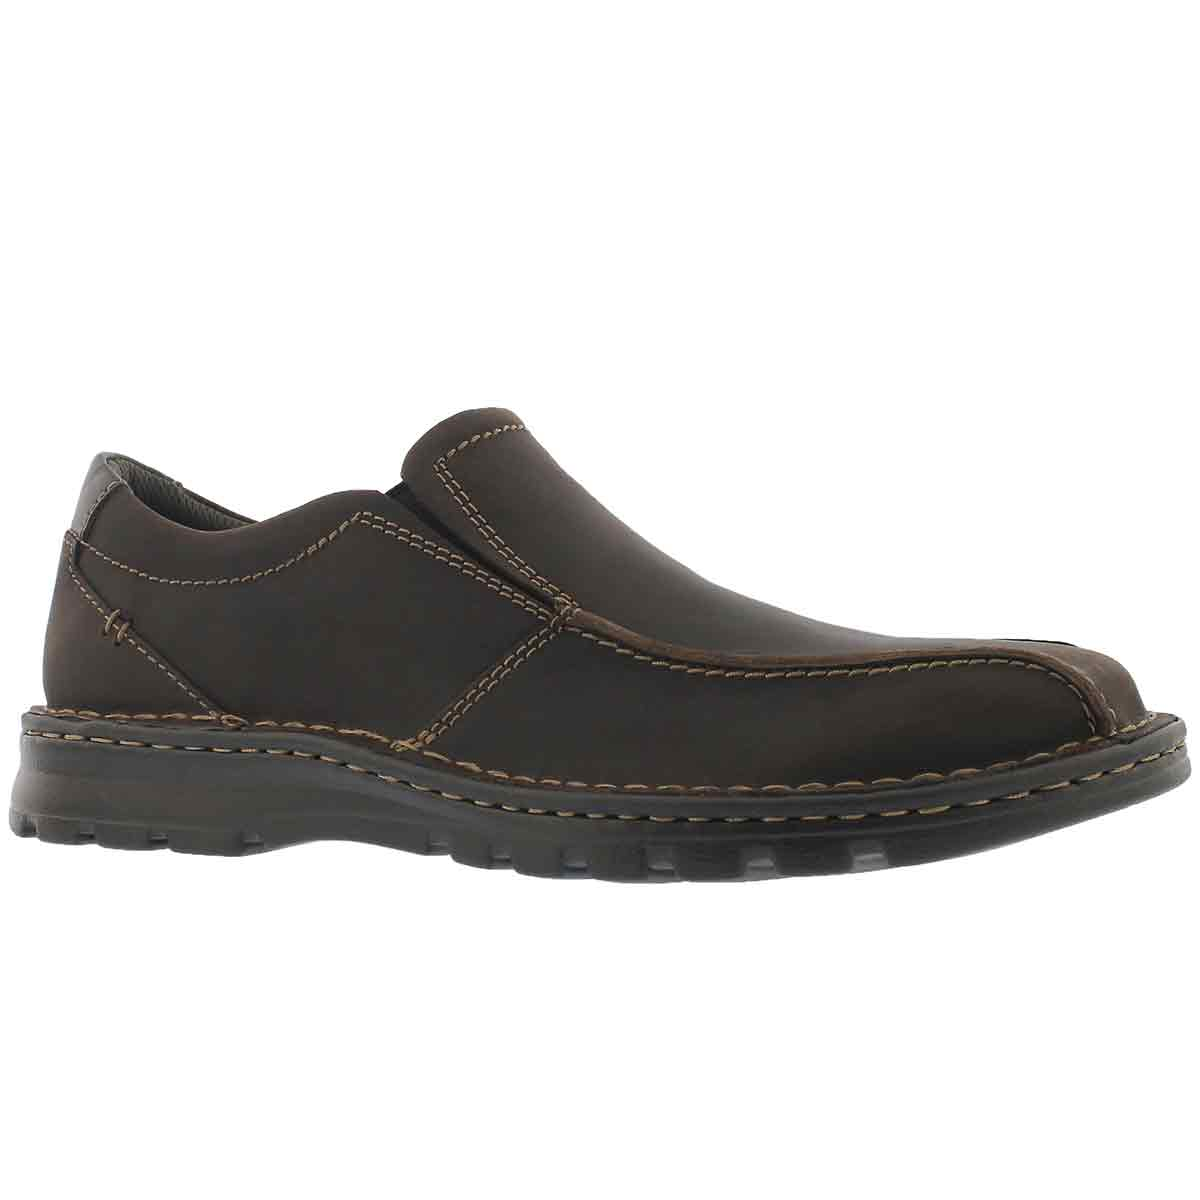 Men's VANEK STEP dark brown casual slip ons